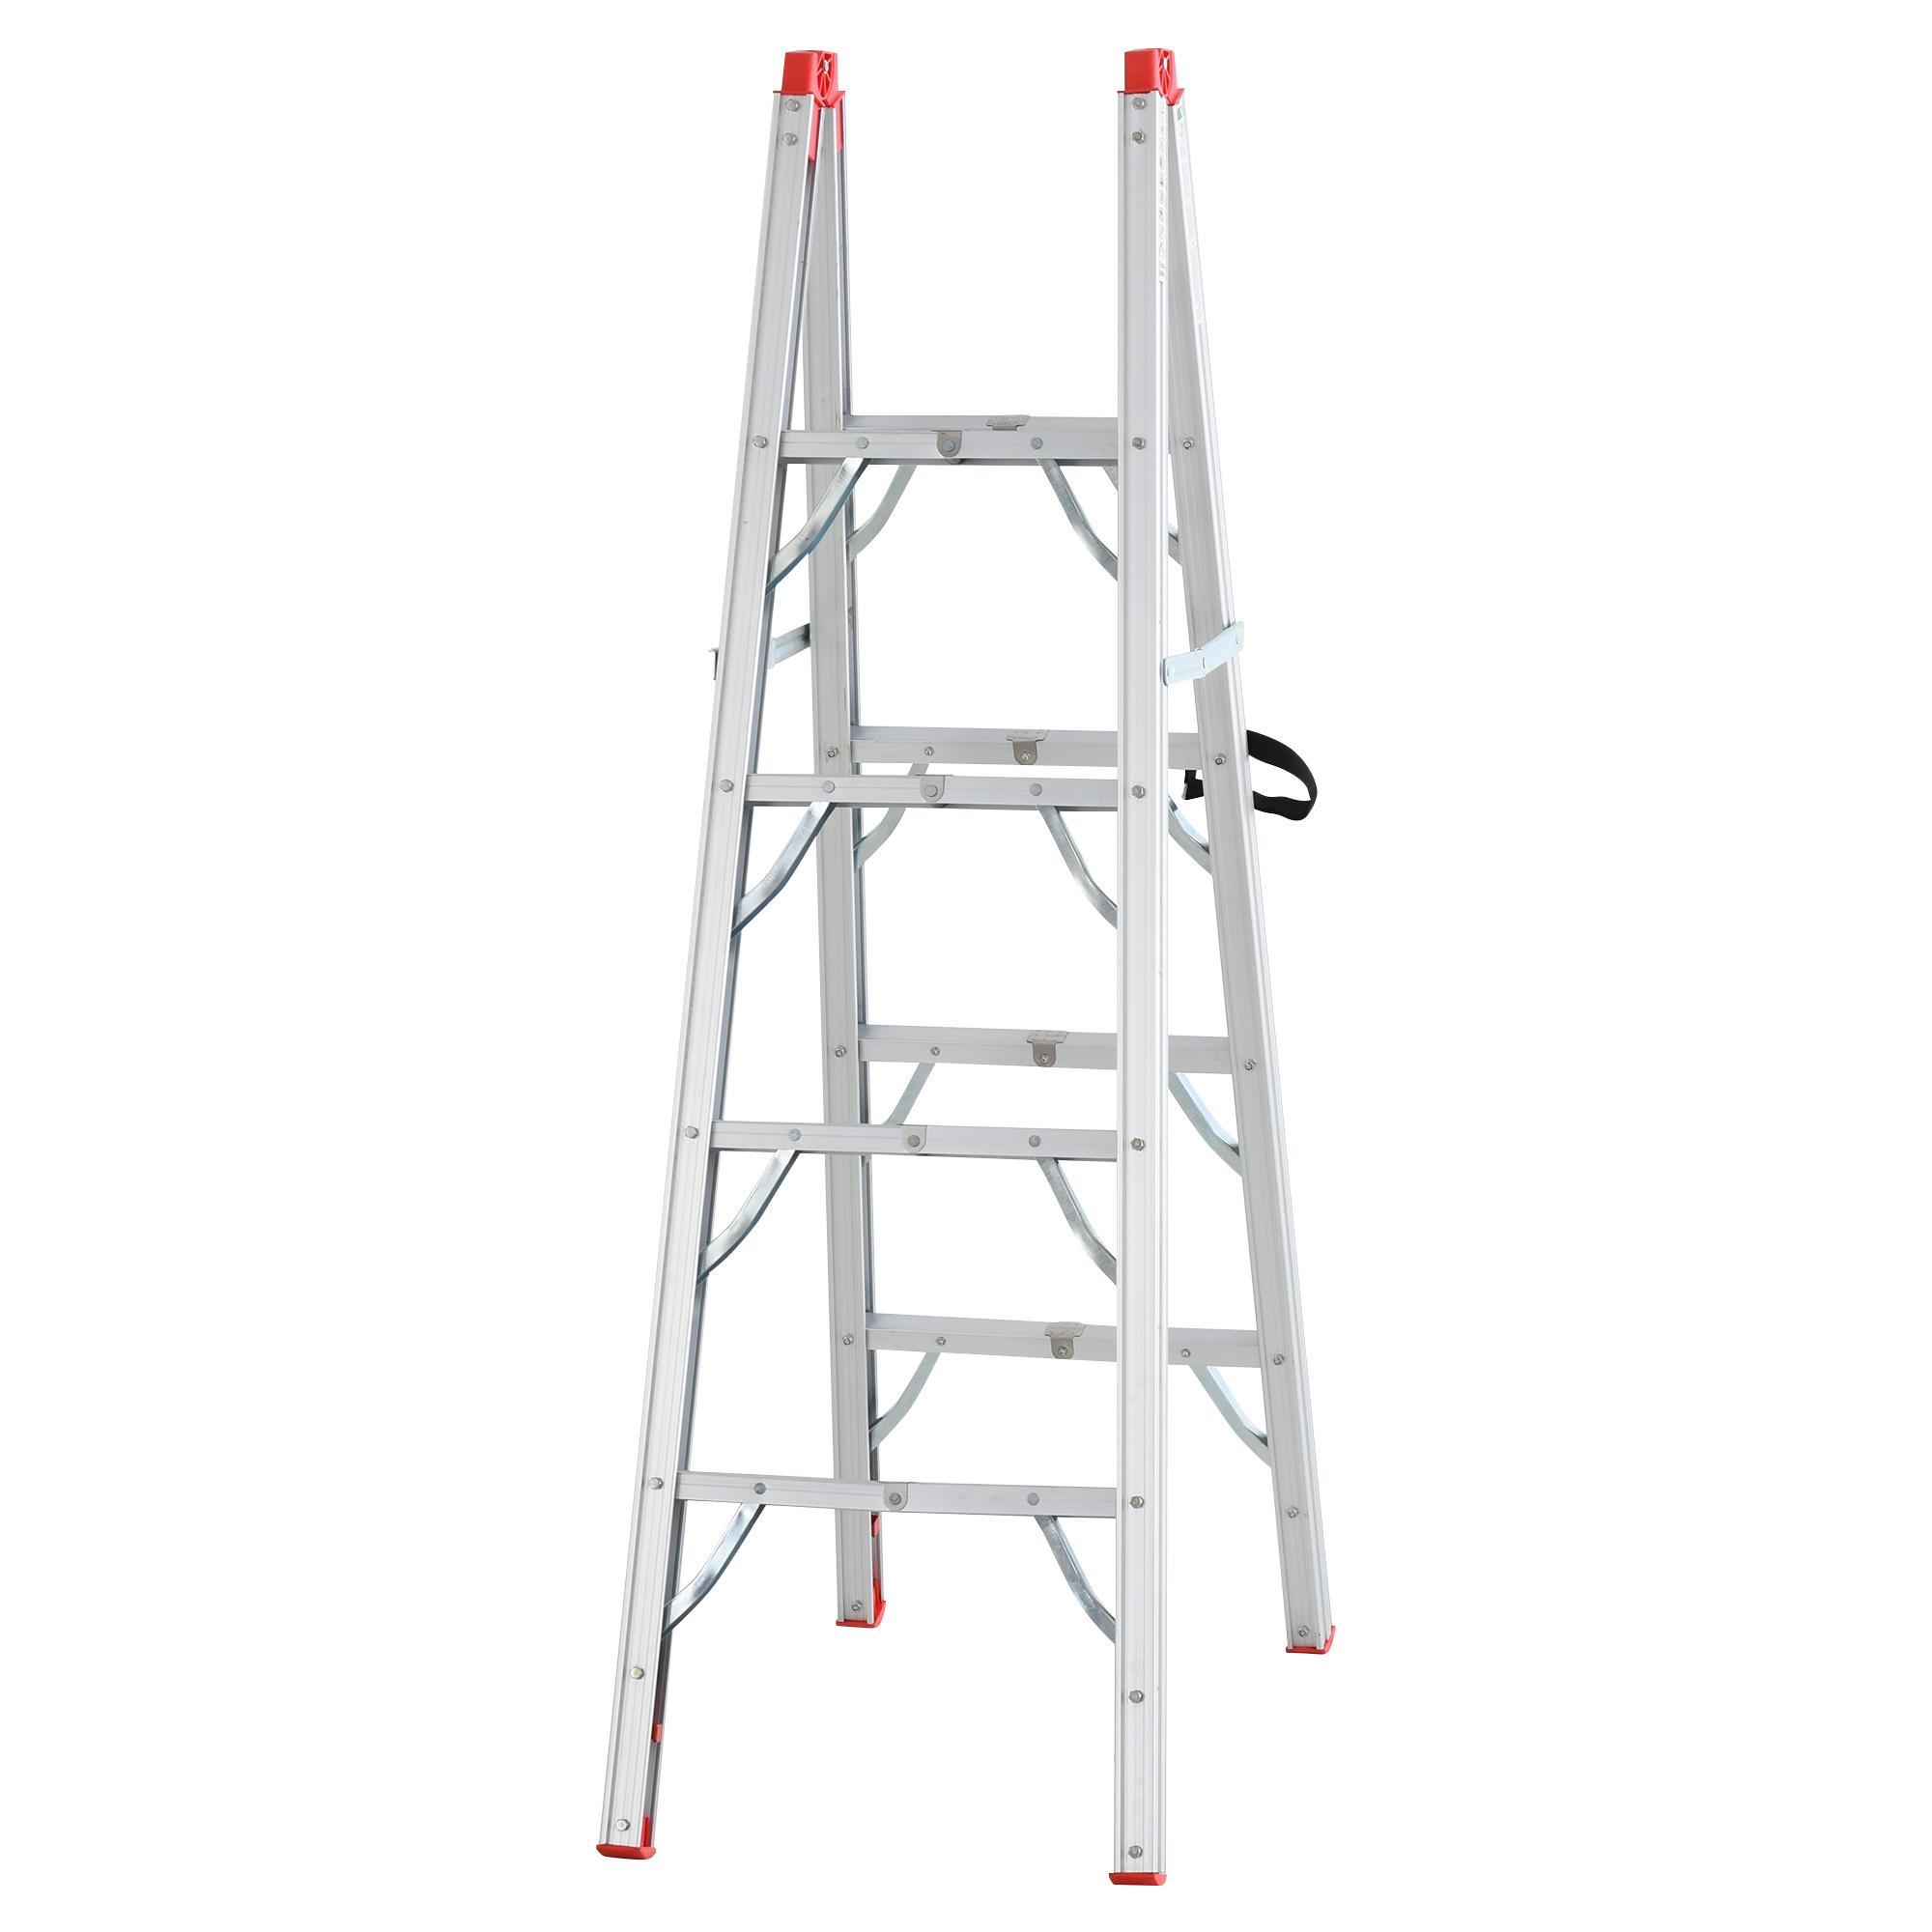 Online Ladders In 2021 Aosom Netherlands